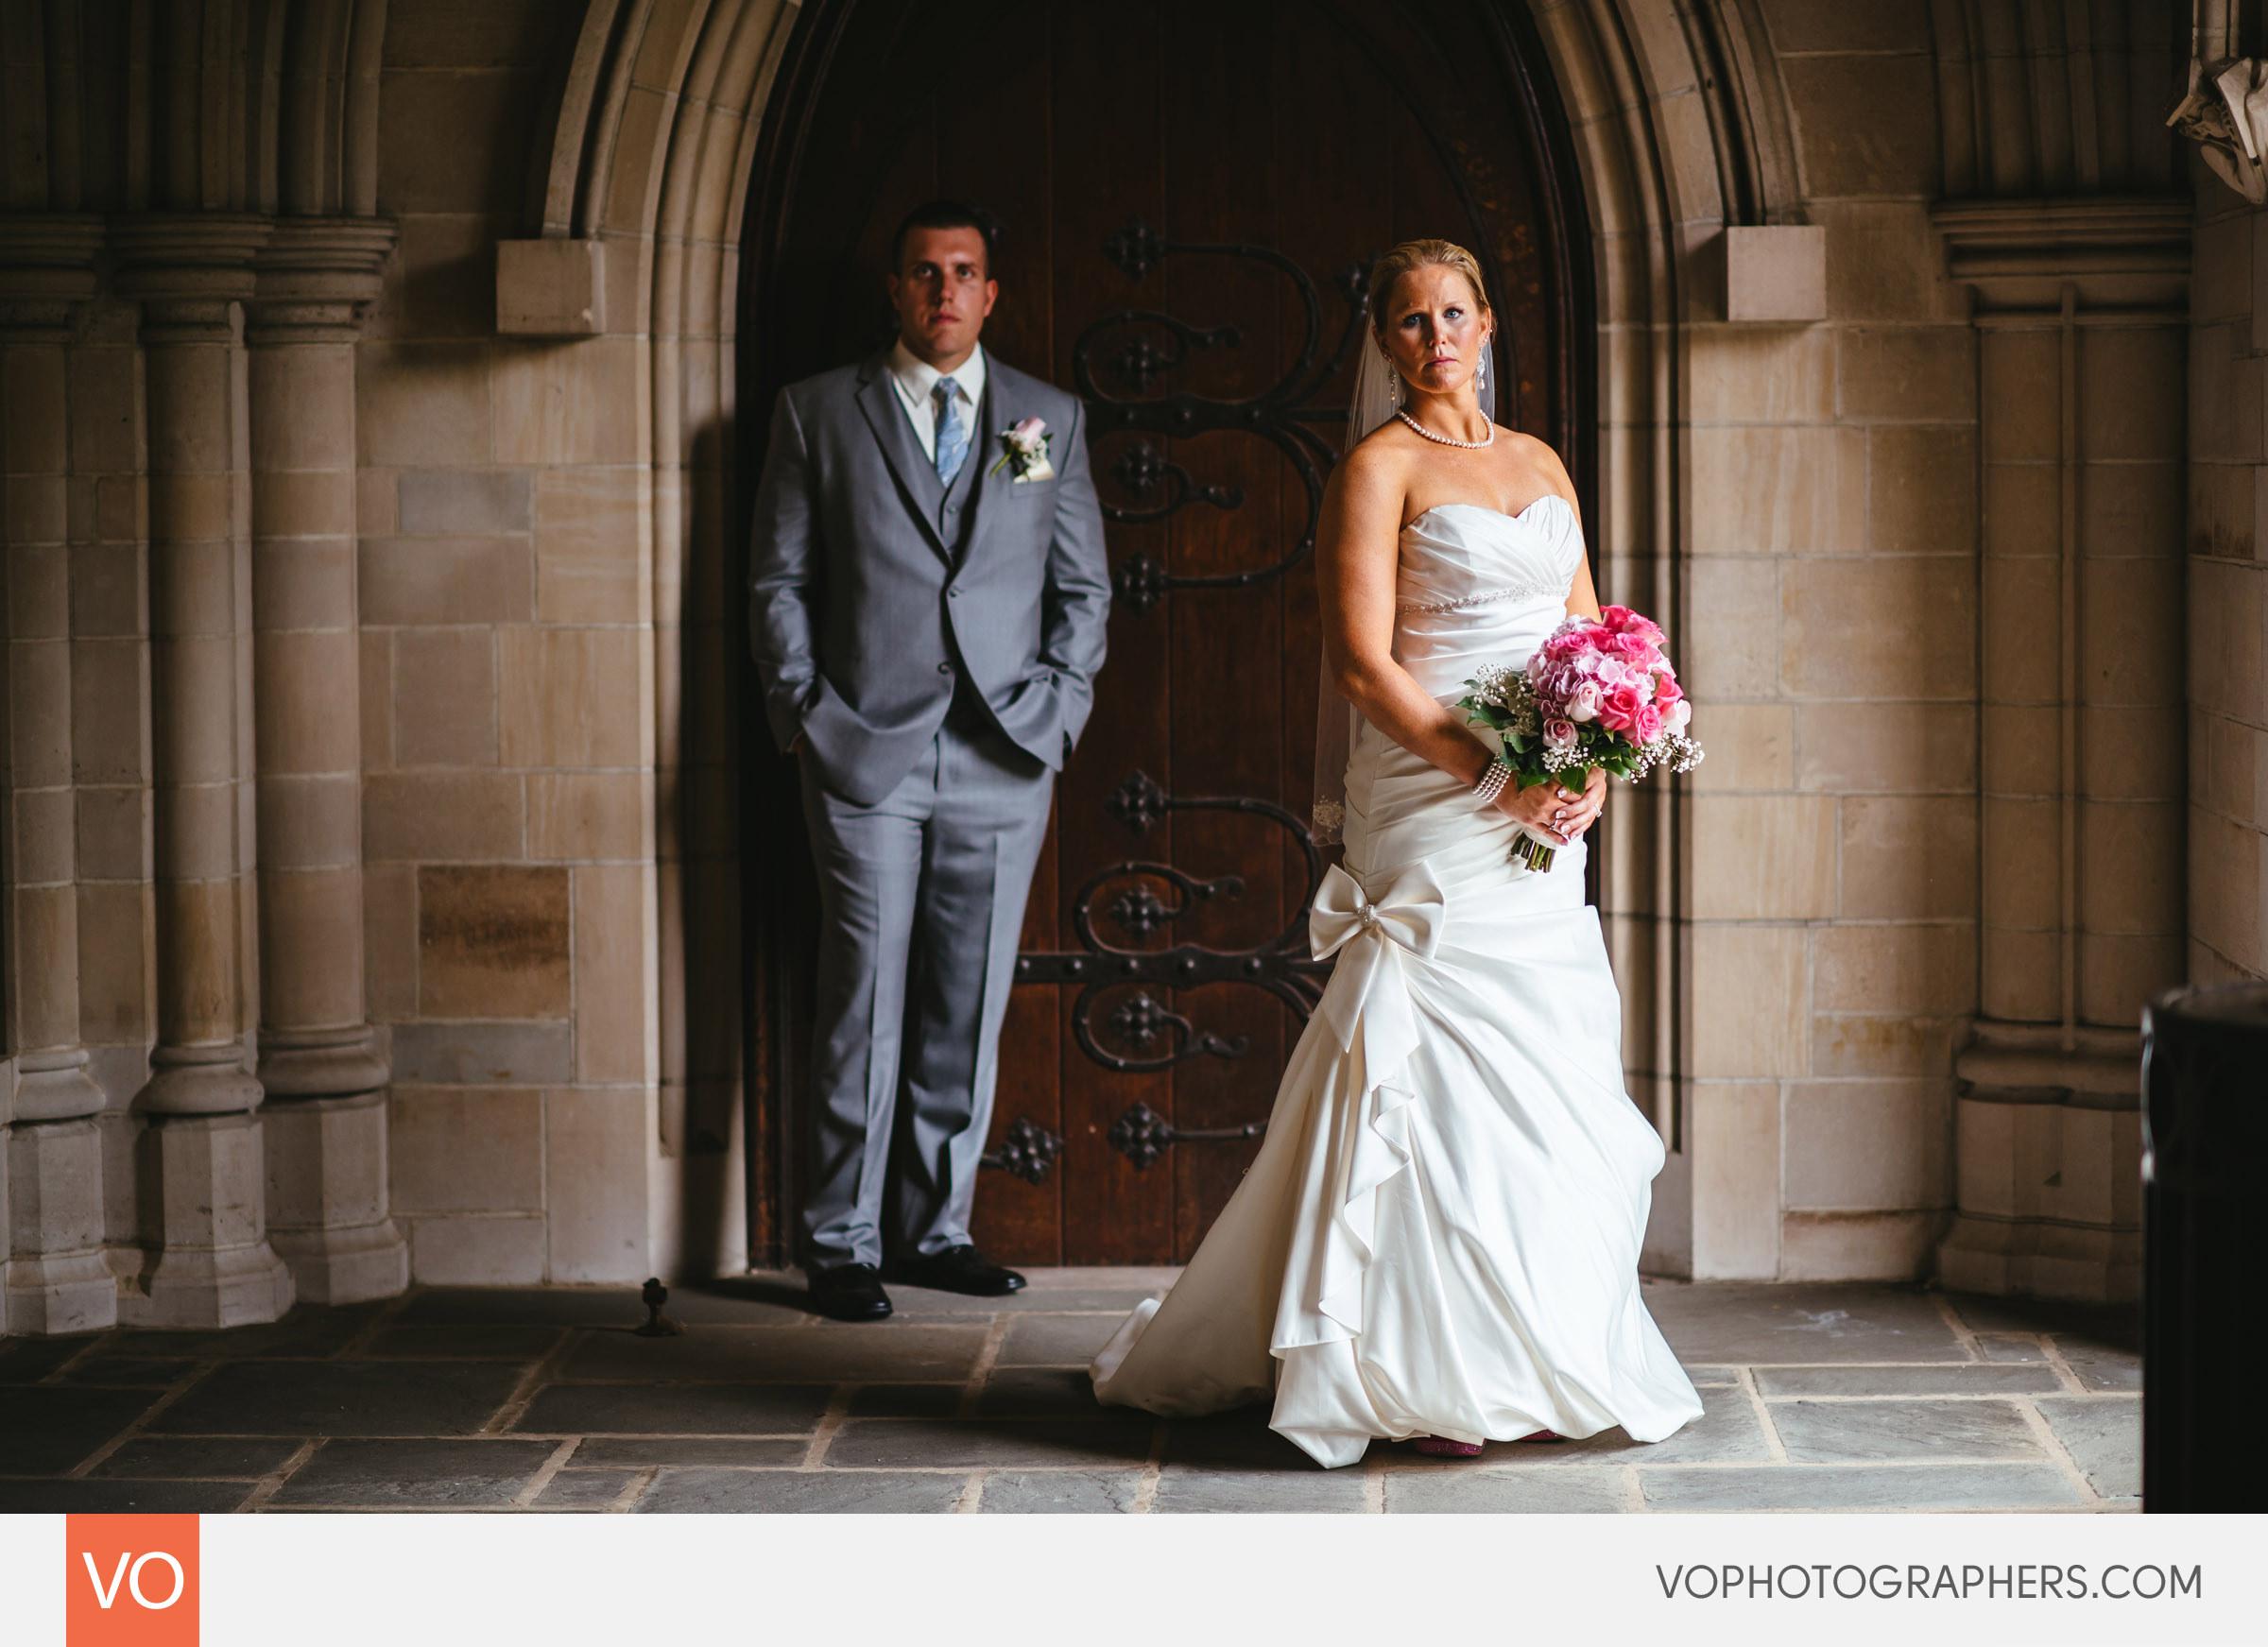 Doubletree-Hotel-Bristol-Wedding-Cathy-Chris-0027